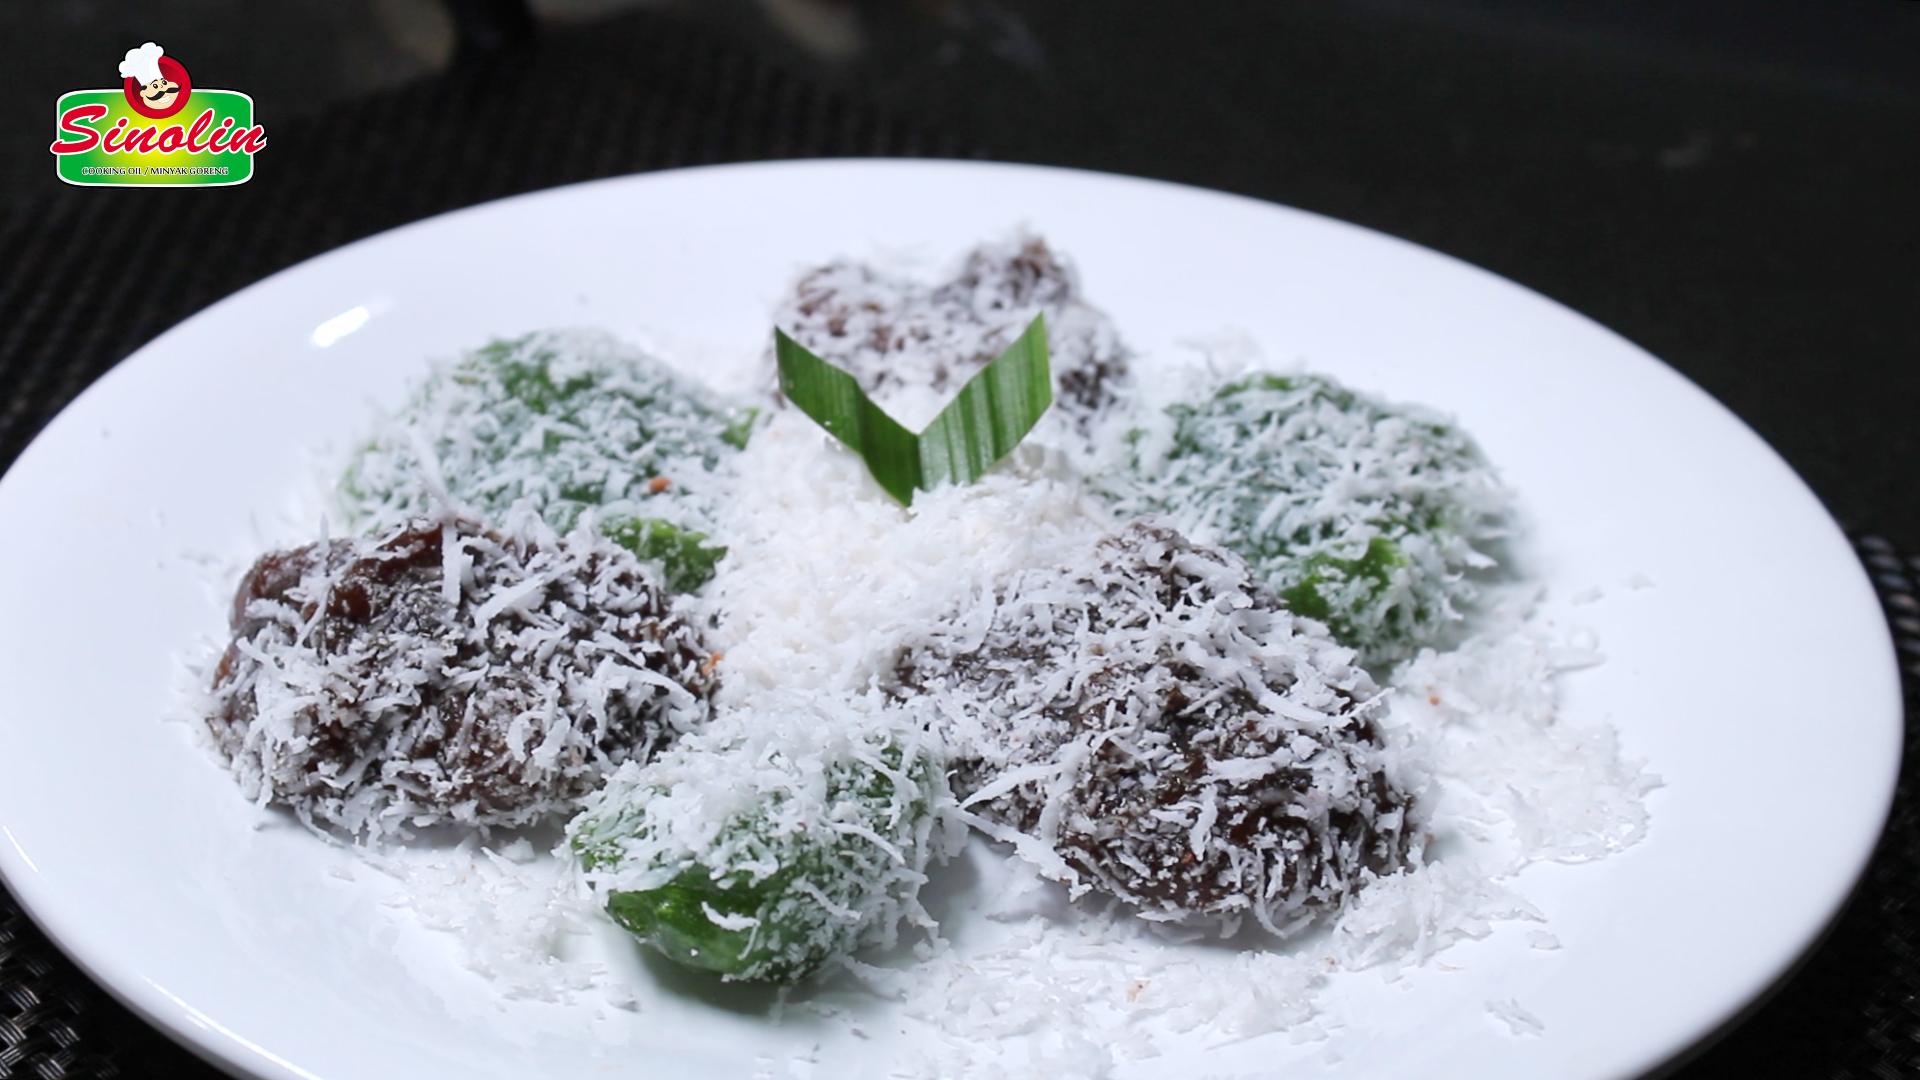 Original Ongol Ongol with Palm Sugar And Pandan Flavor By Dapur Sinolin